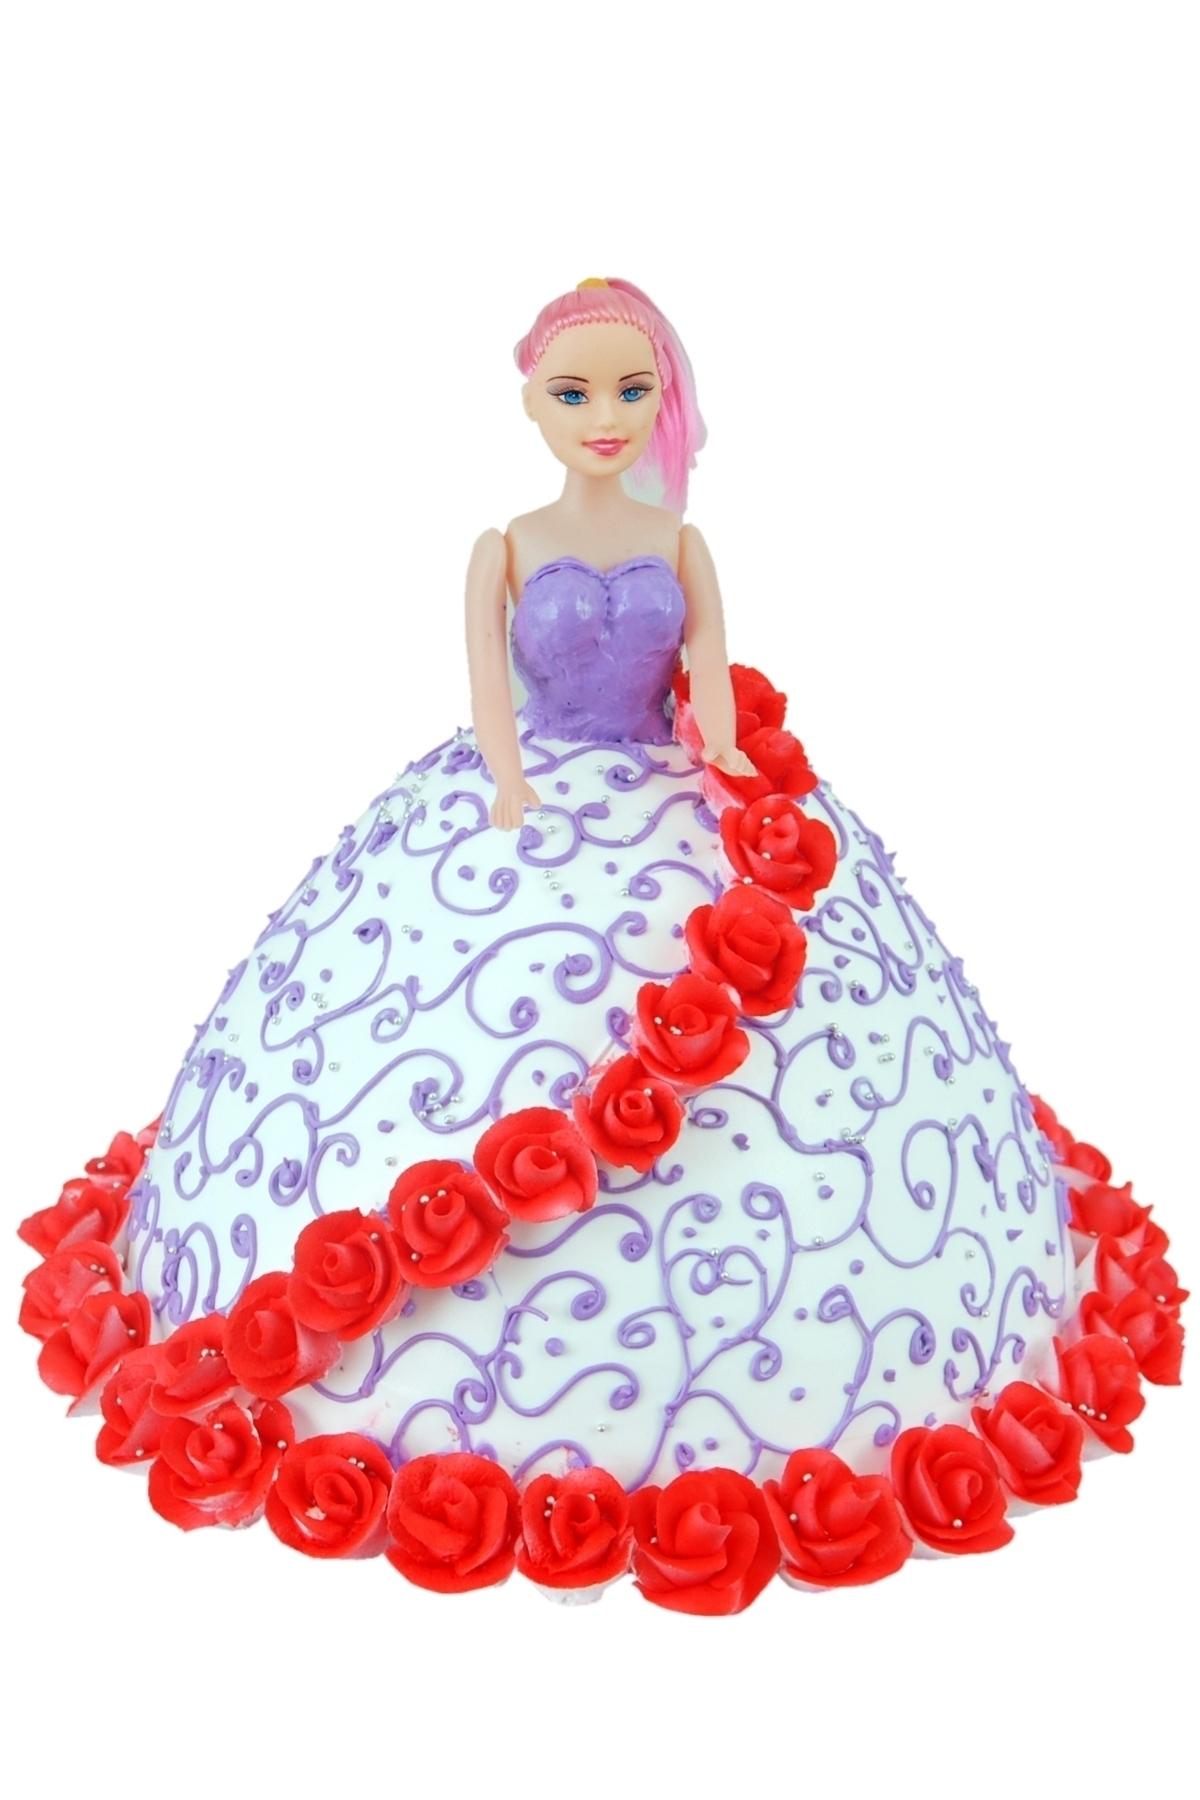 Barbie Shape Cake in Pune Designs, Images, Price